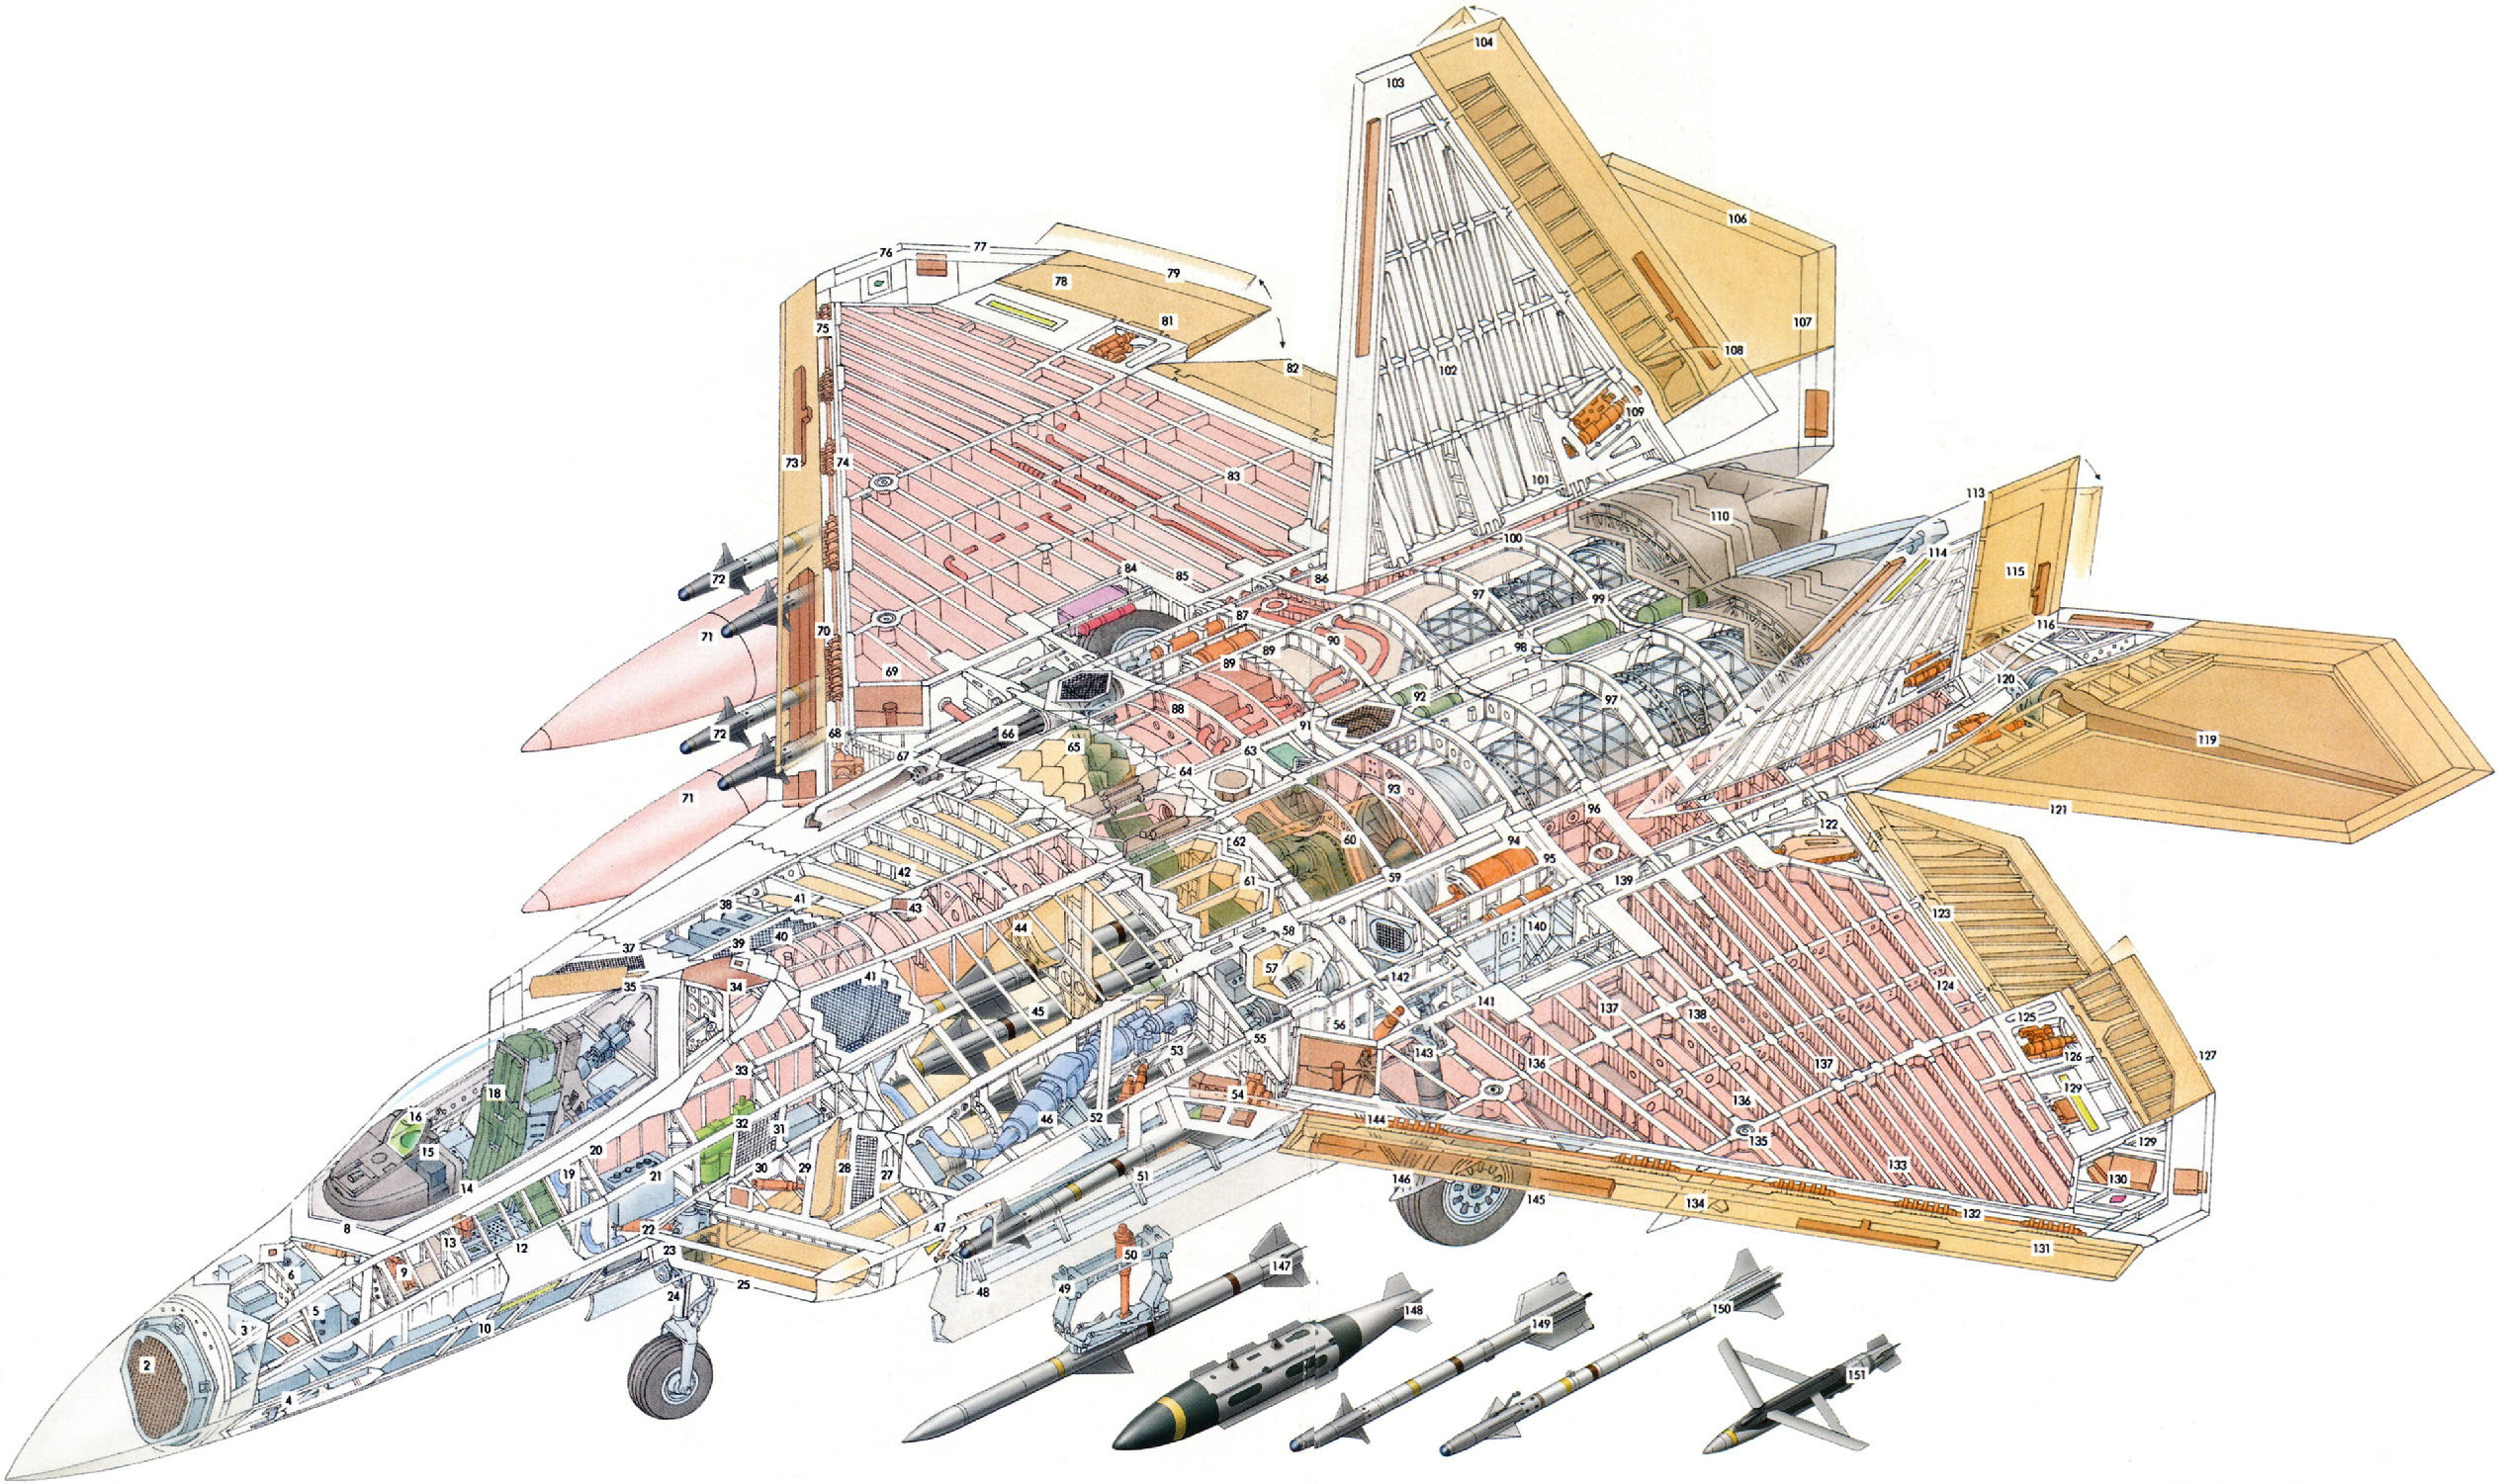 Lockheed Martin F-22 Raptor cutaway